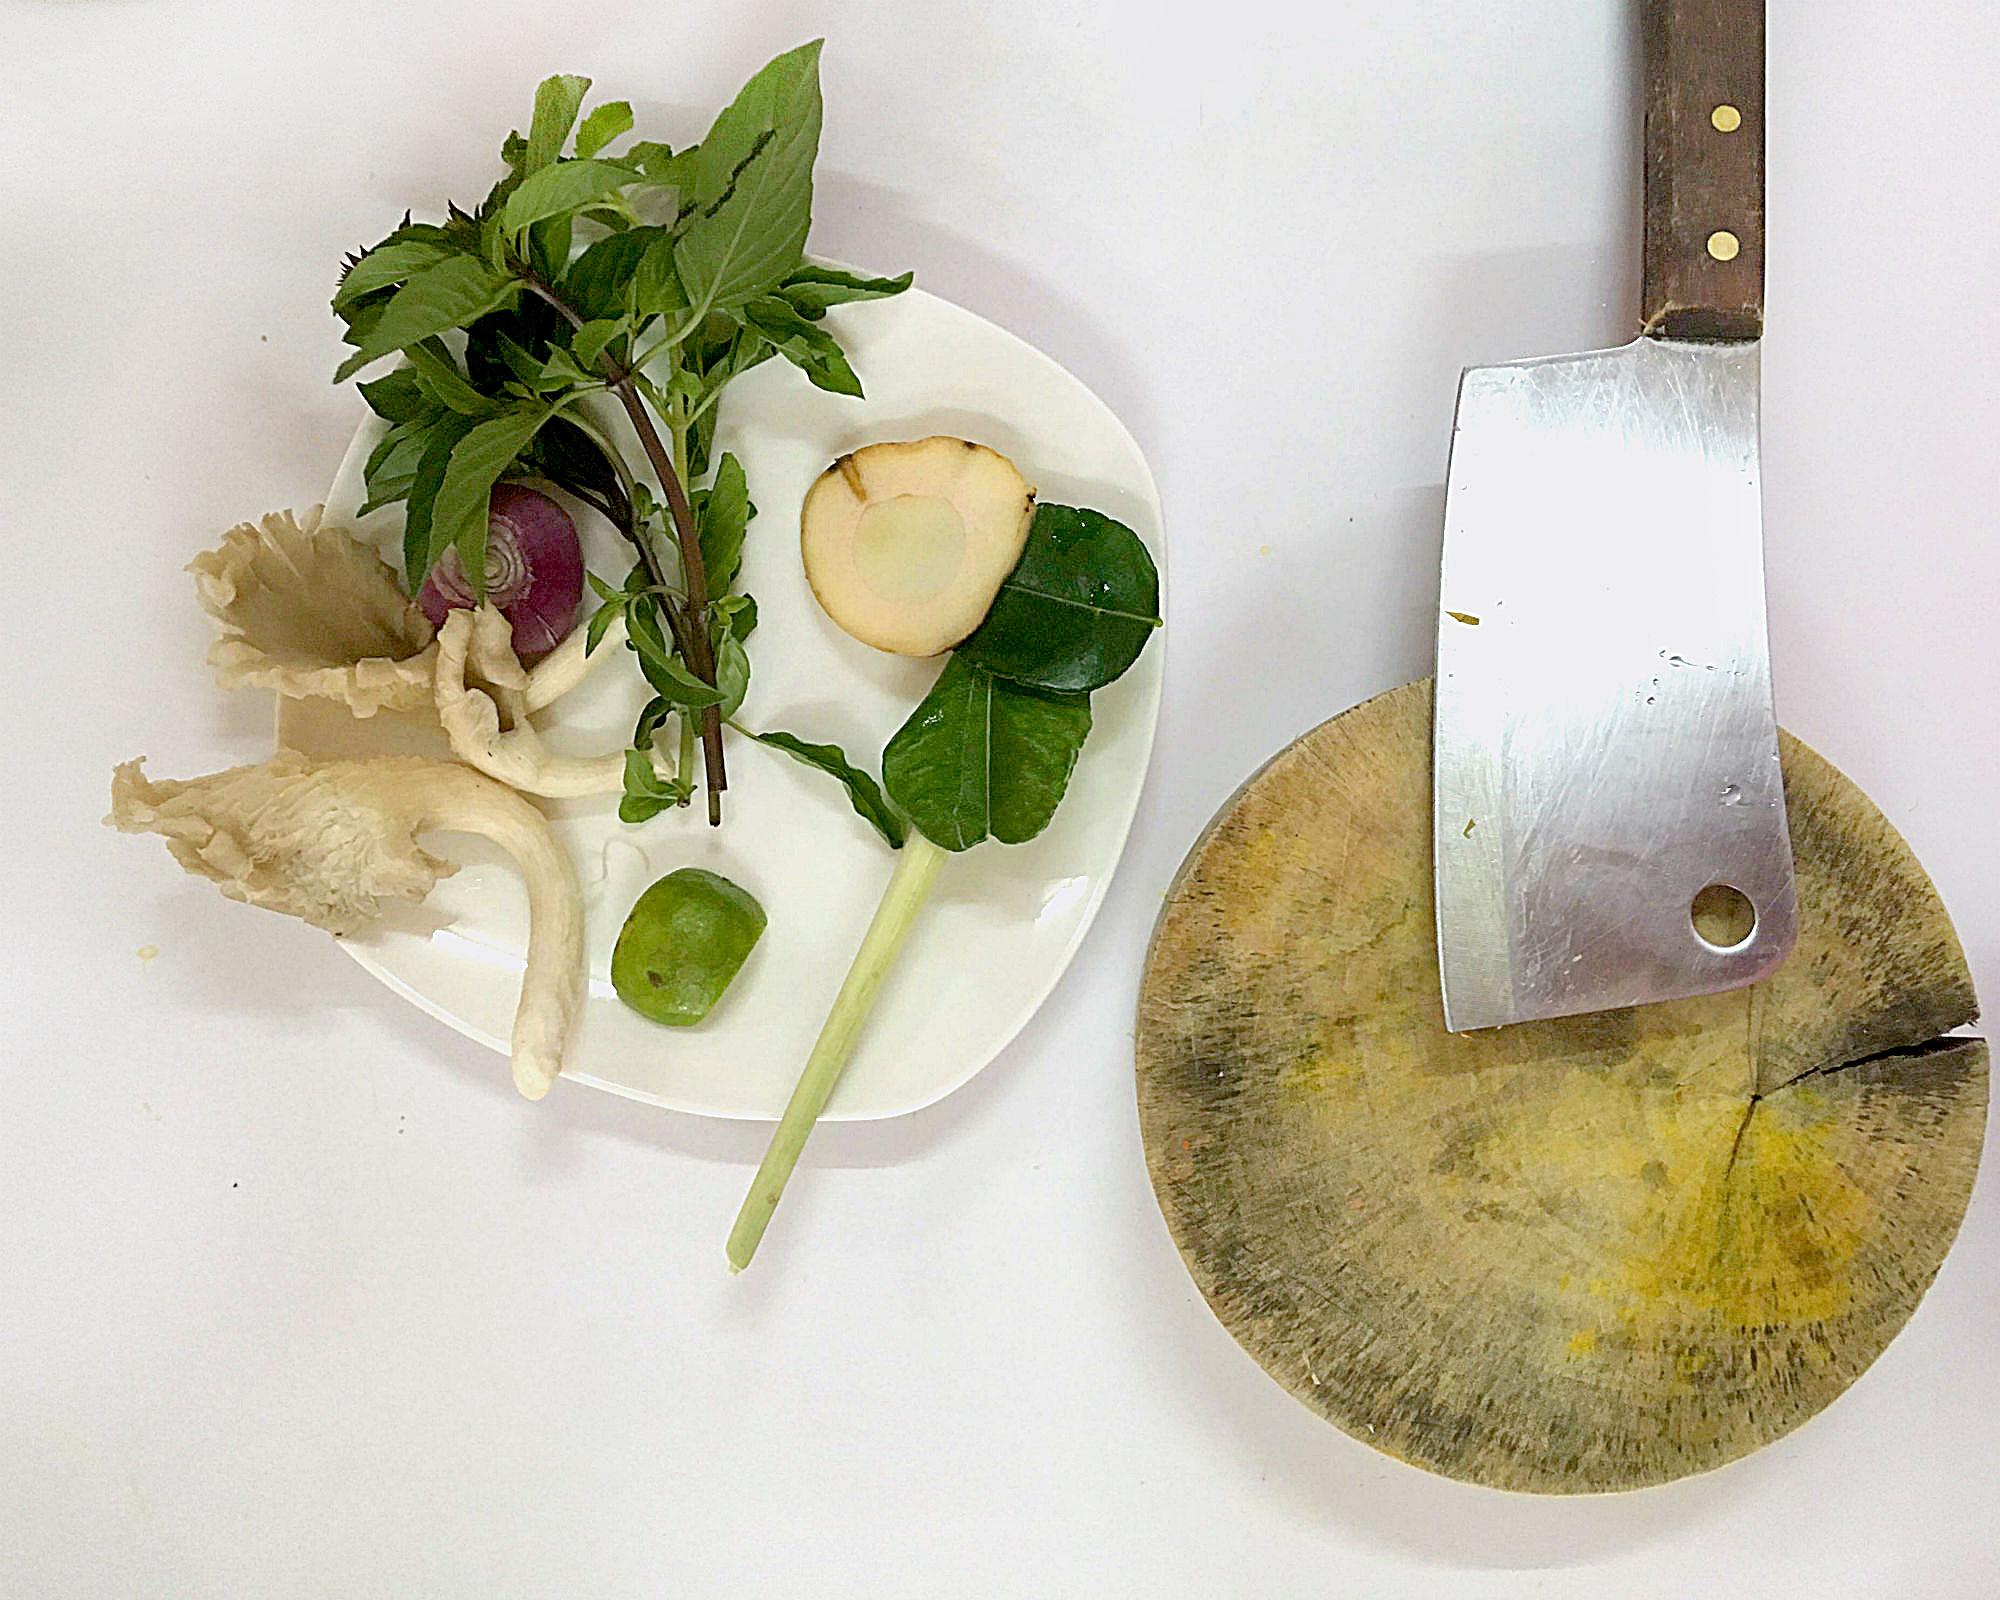 Kochkurs bei der Asia Scenice Cooking School